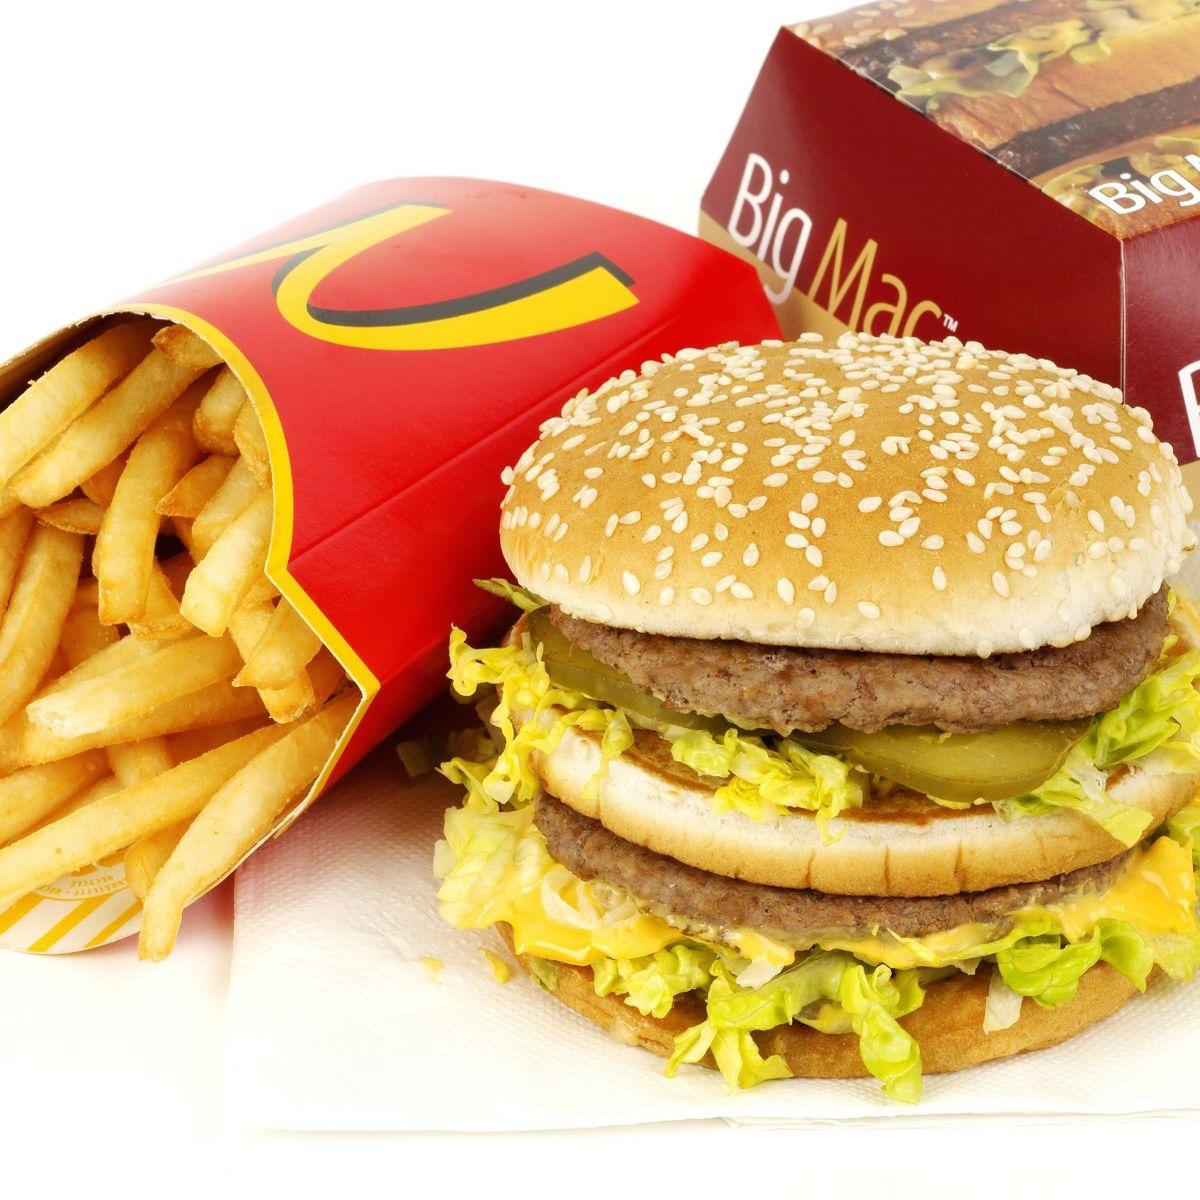 McDonald's Monday 03/05 - Sandwich (e.g. Big Mac / Quarter Pounder with cheese) + Medium Fries £1.99 via app @ McDonald's